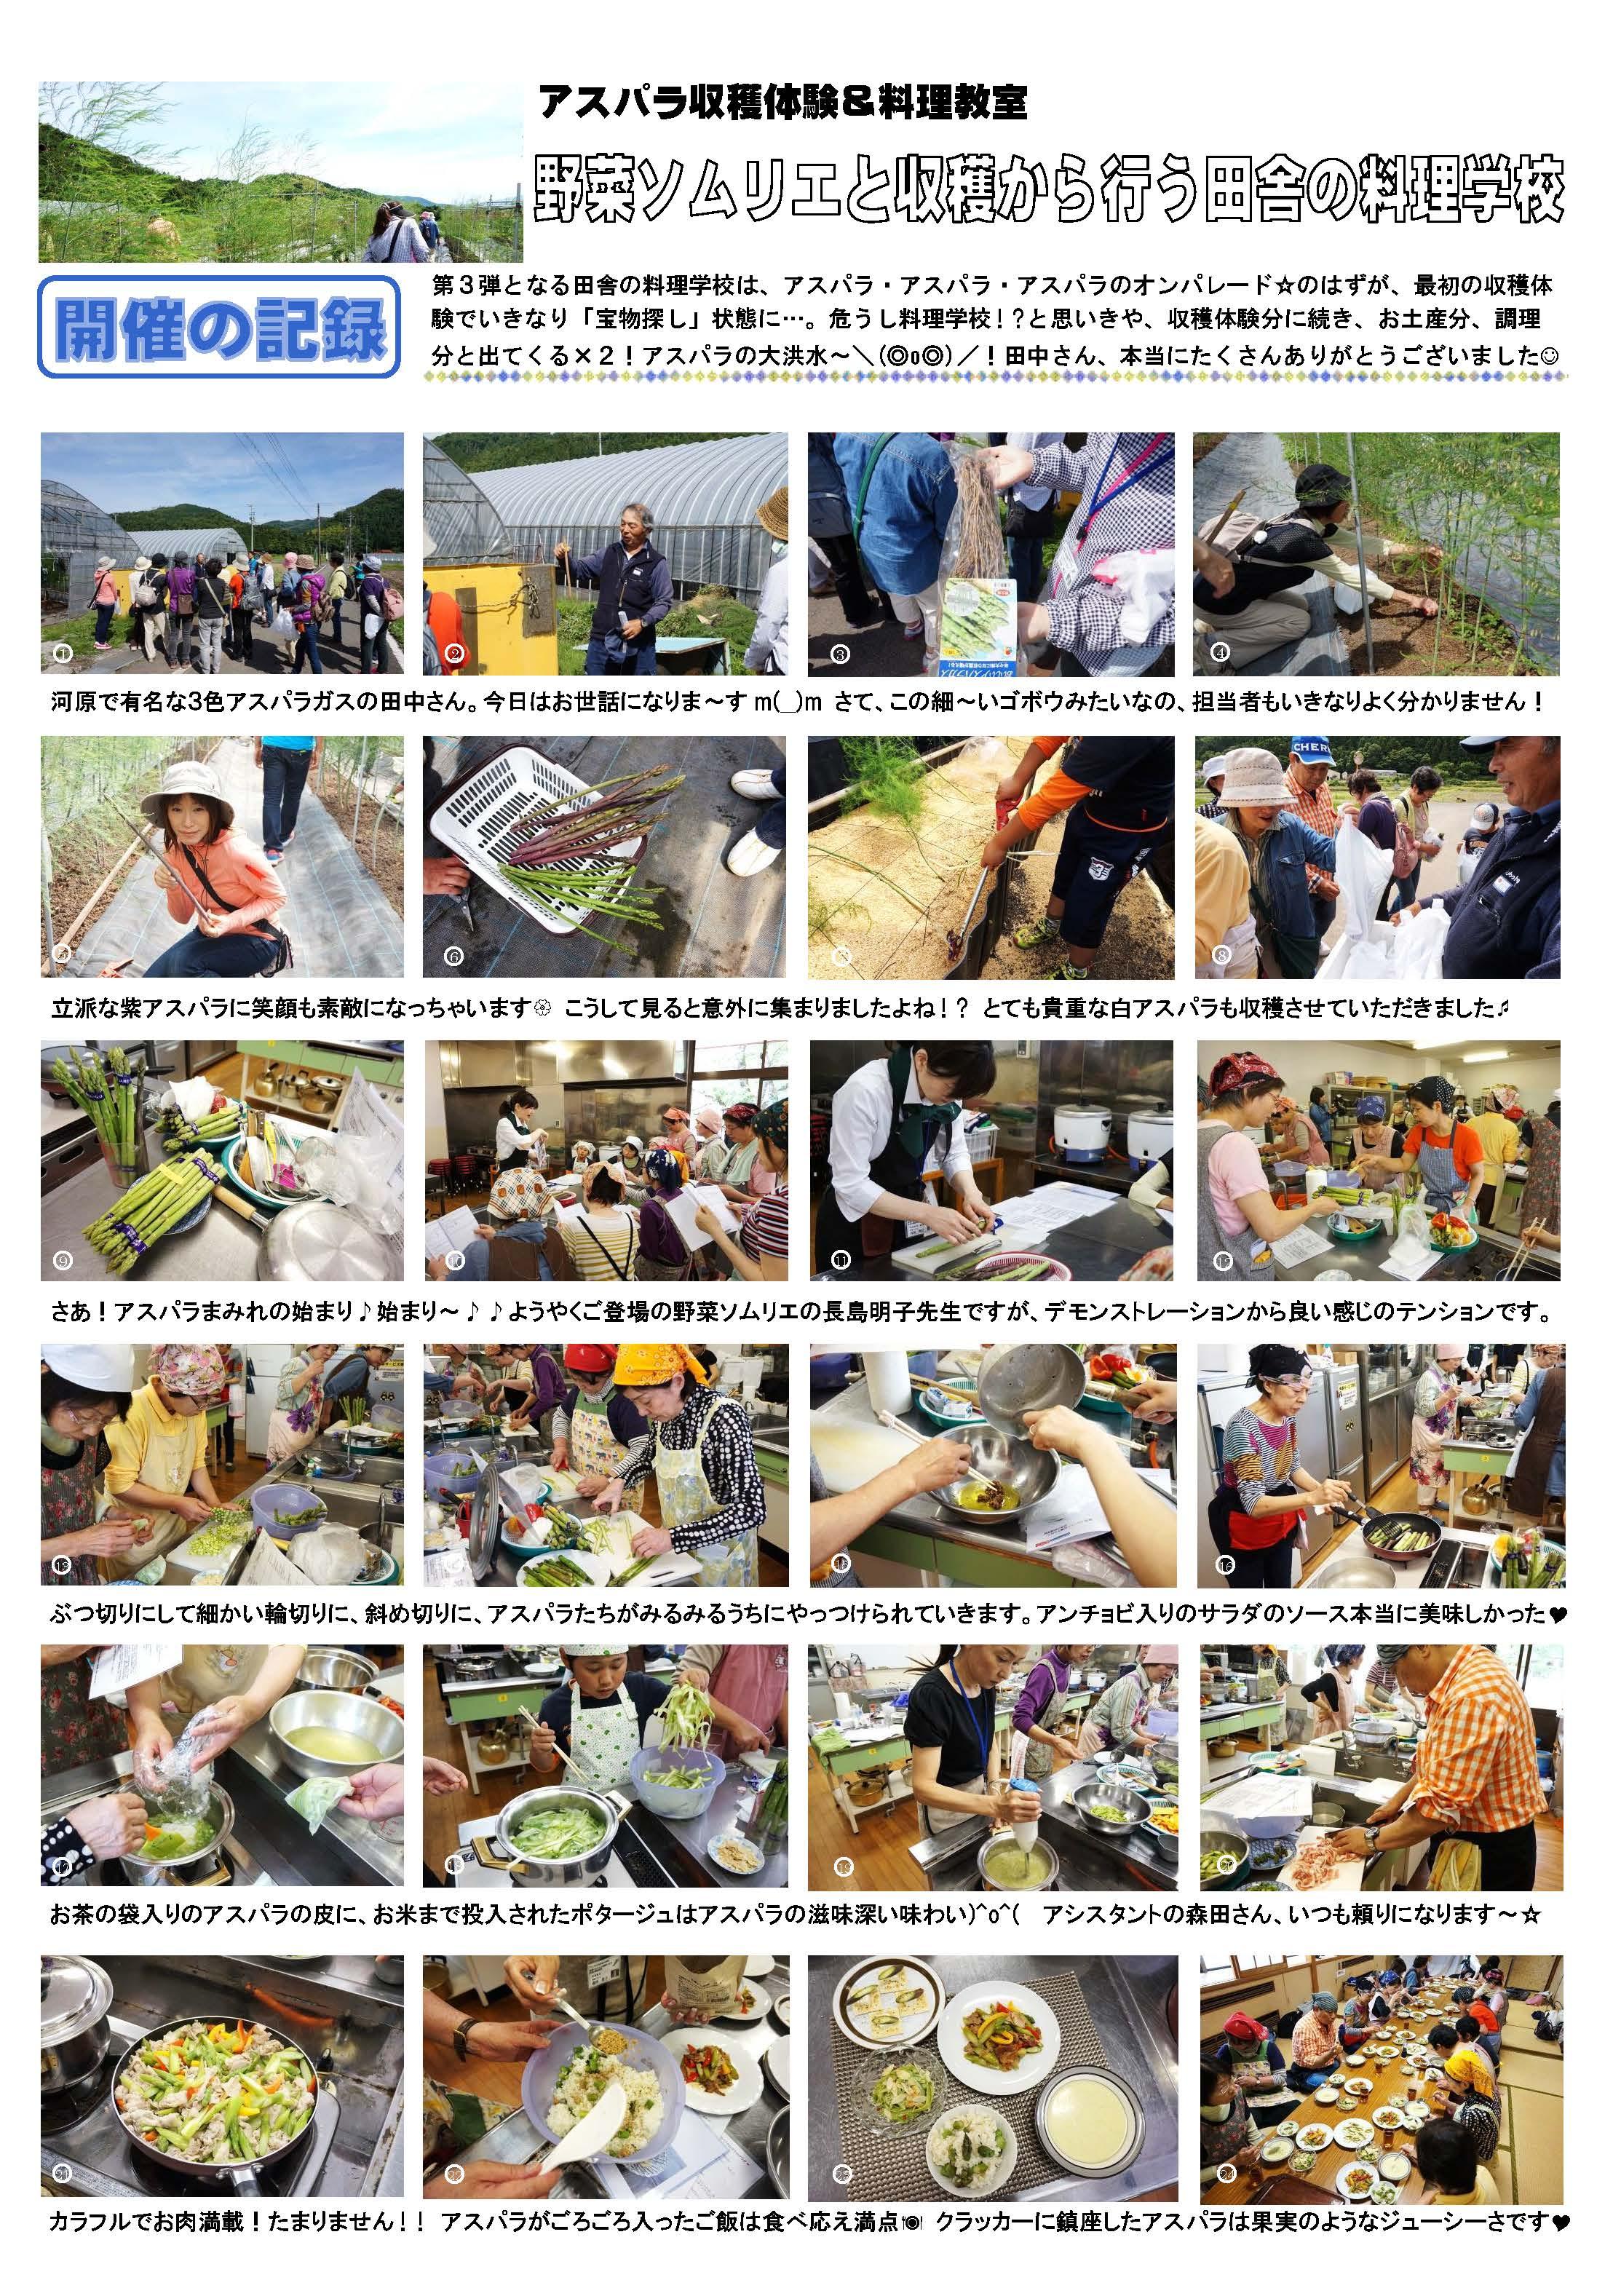 第3回田舎の料理学校開催記録